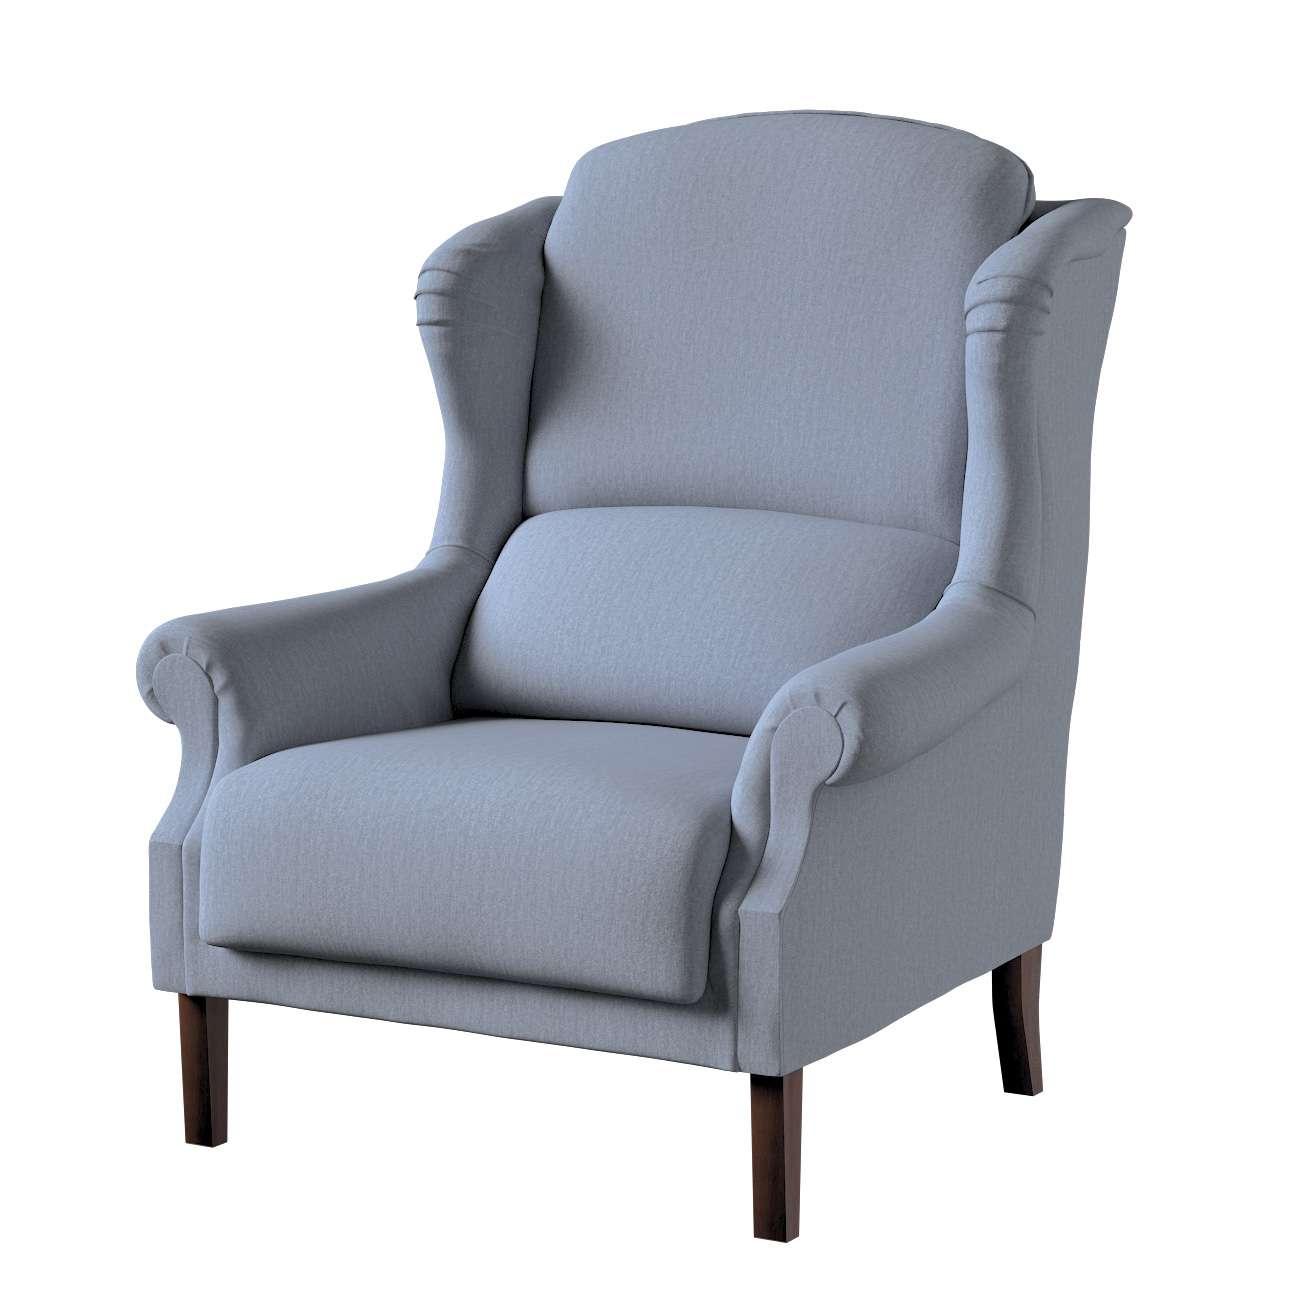 Stilingas Dekoria fotelis 63 x 115 cm kolekcijoje Chenille, audinys: 702-13